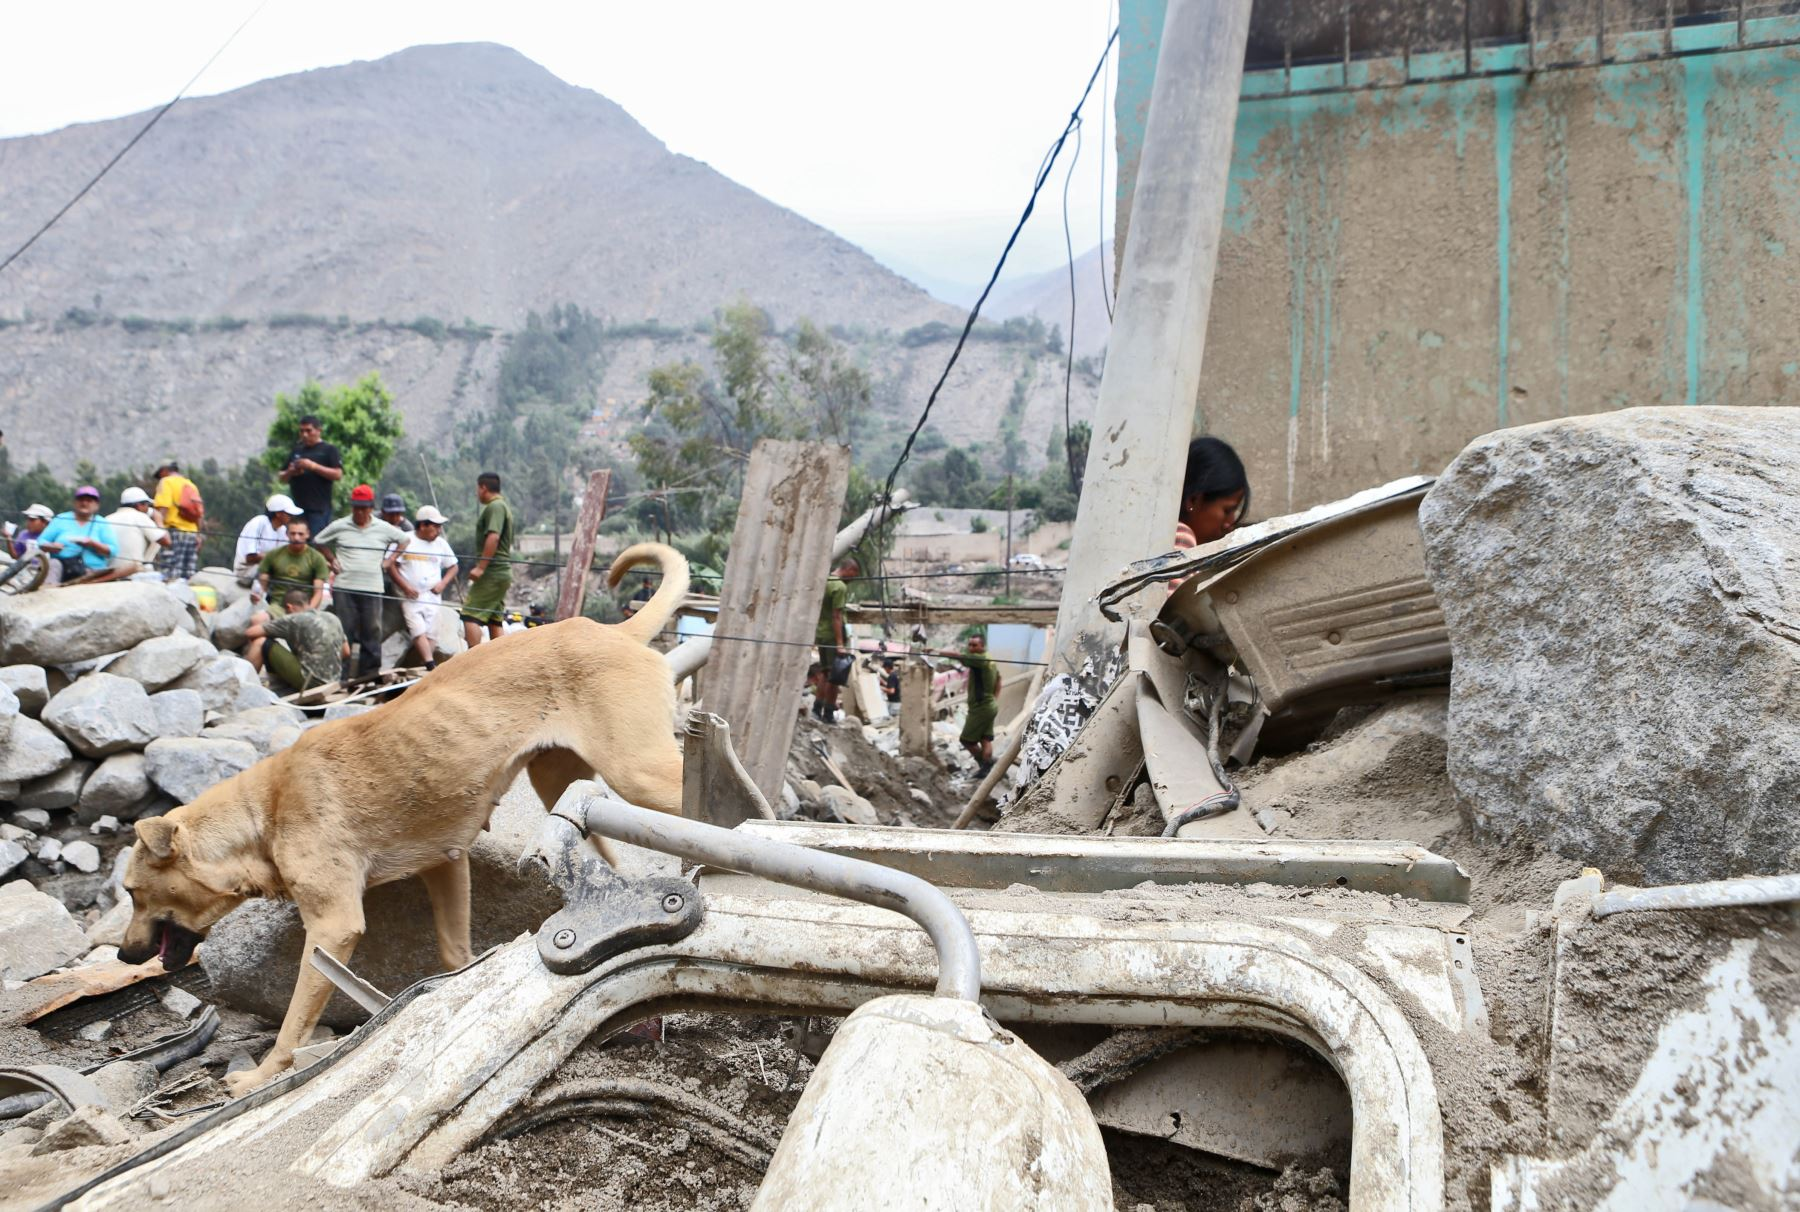 Huaico dejó sin vivienda a decenas de famlias. Foto: ANDINA/Oscar Farje